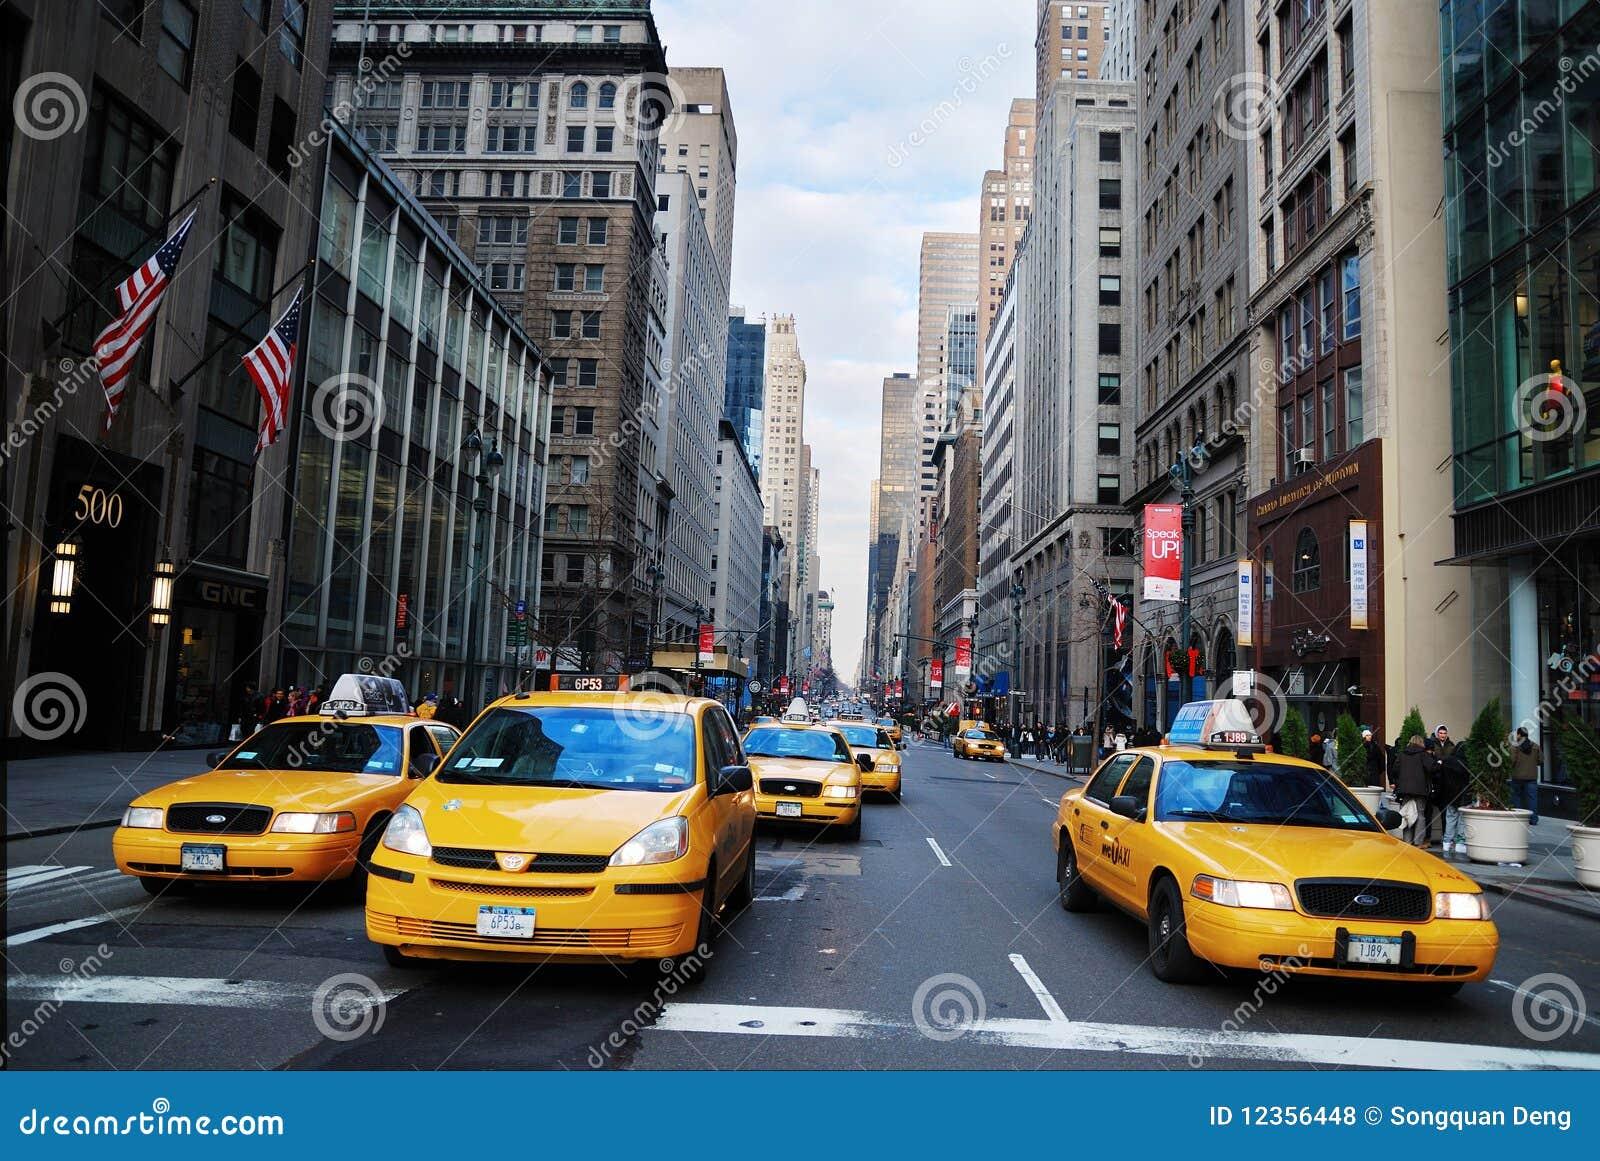 taxi jaune de taxi de new york city photo stock ditorial. Black Bedroom Furniture Sets. Home Design Ideas